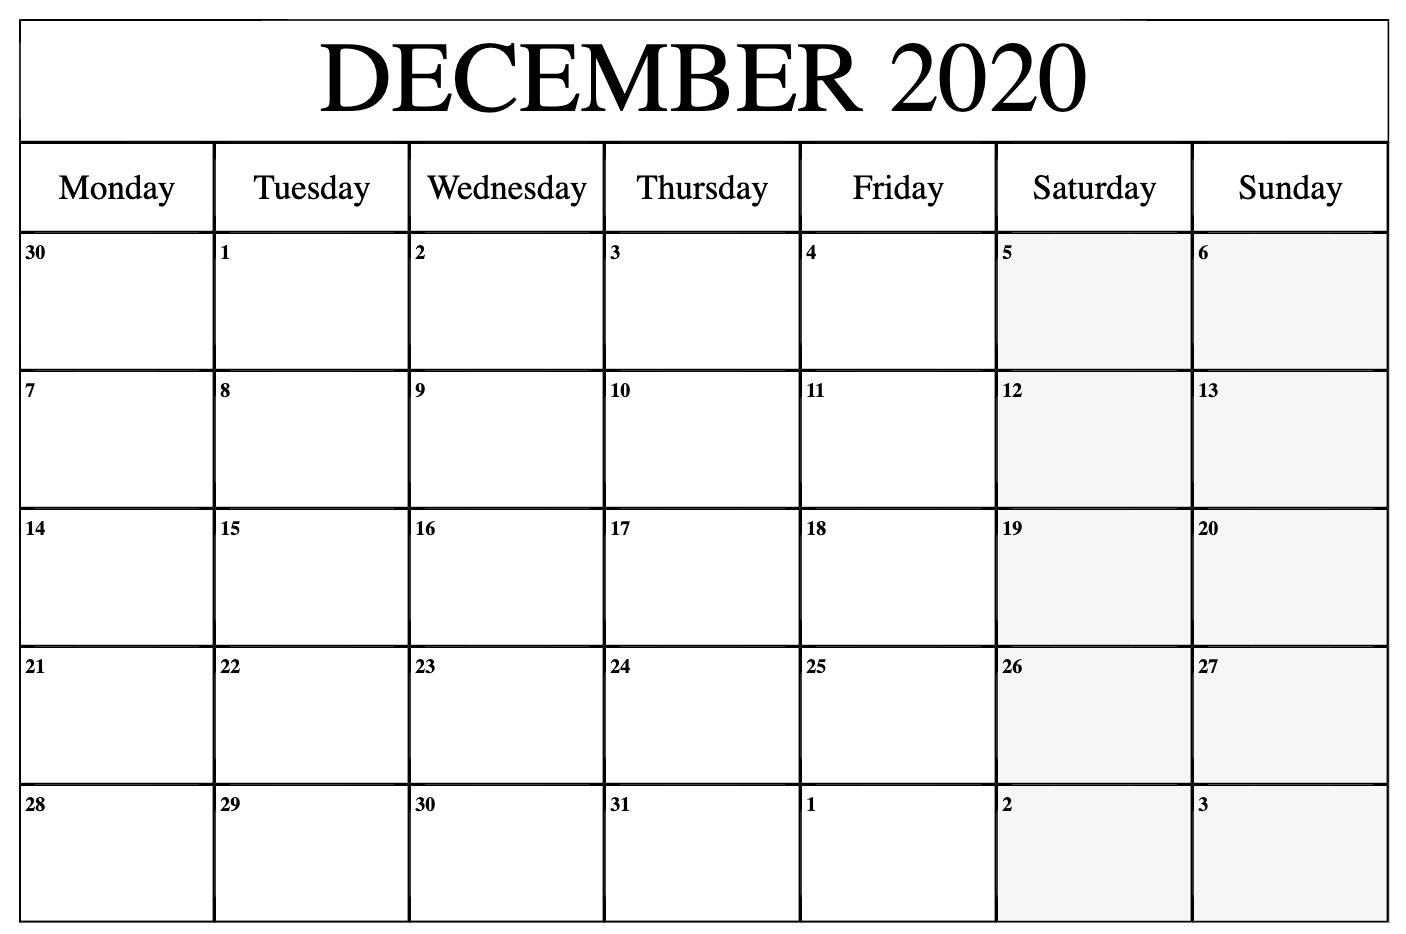 December 2020 Calendar Printable Monday